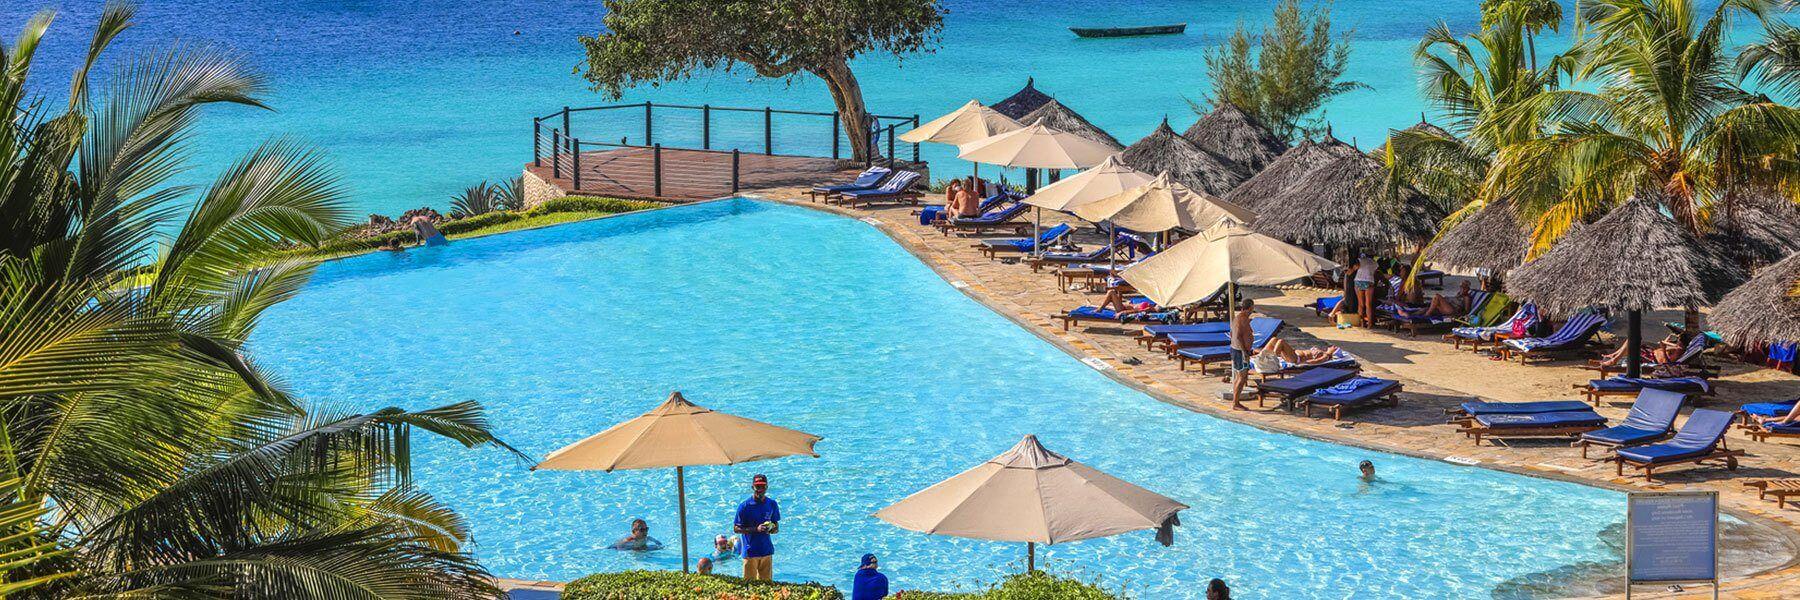 Zanzibar Beach Hotel Amenities